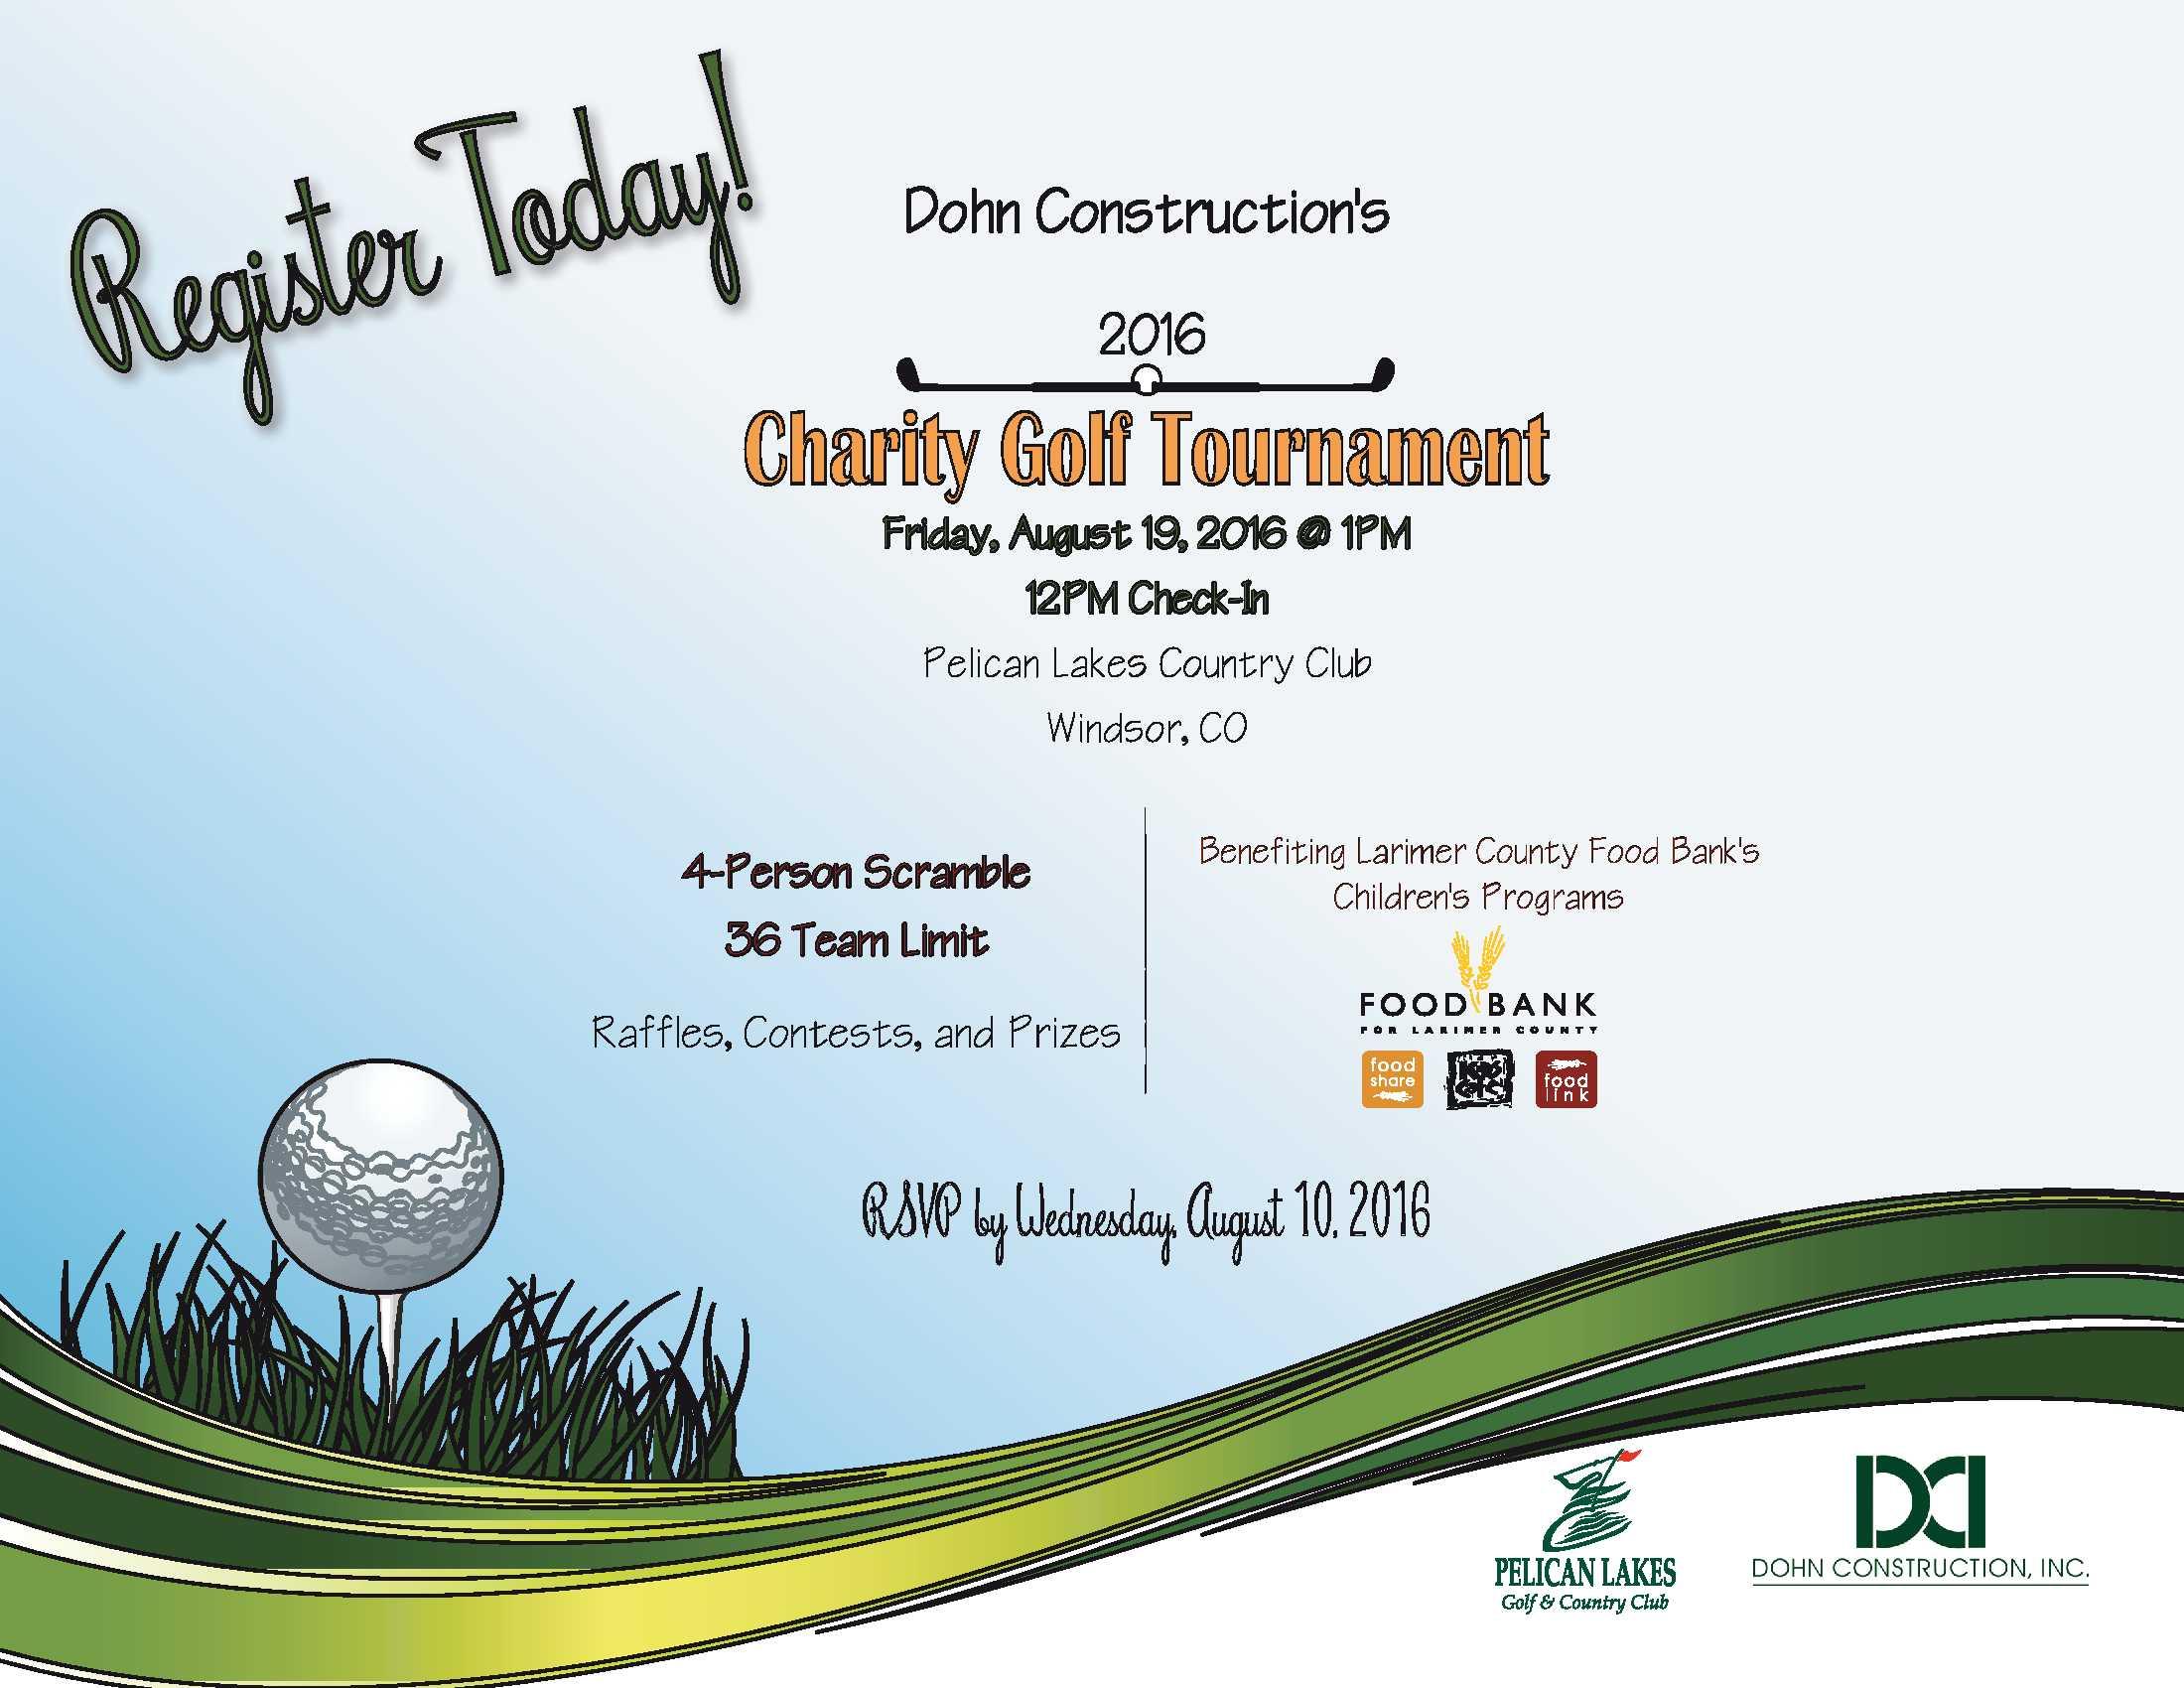 dohn construction s charity golf tournament food bank